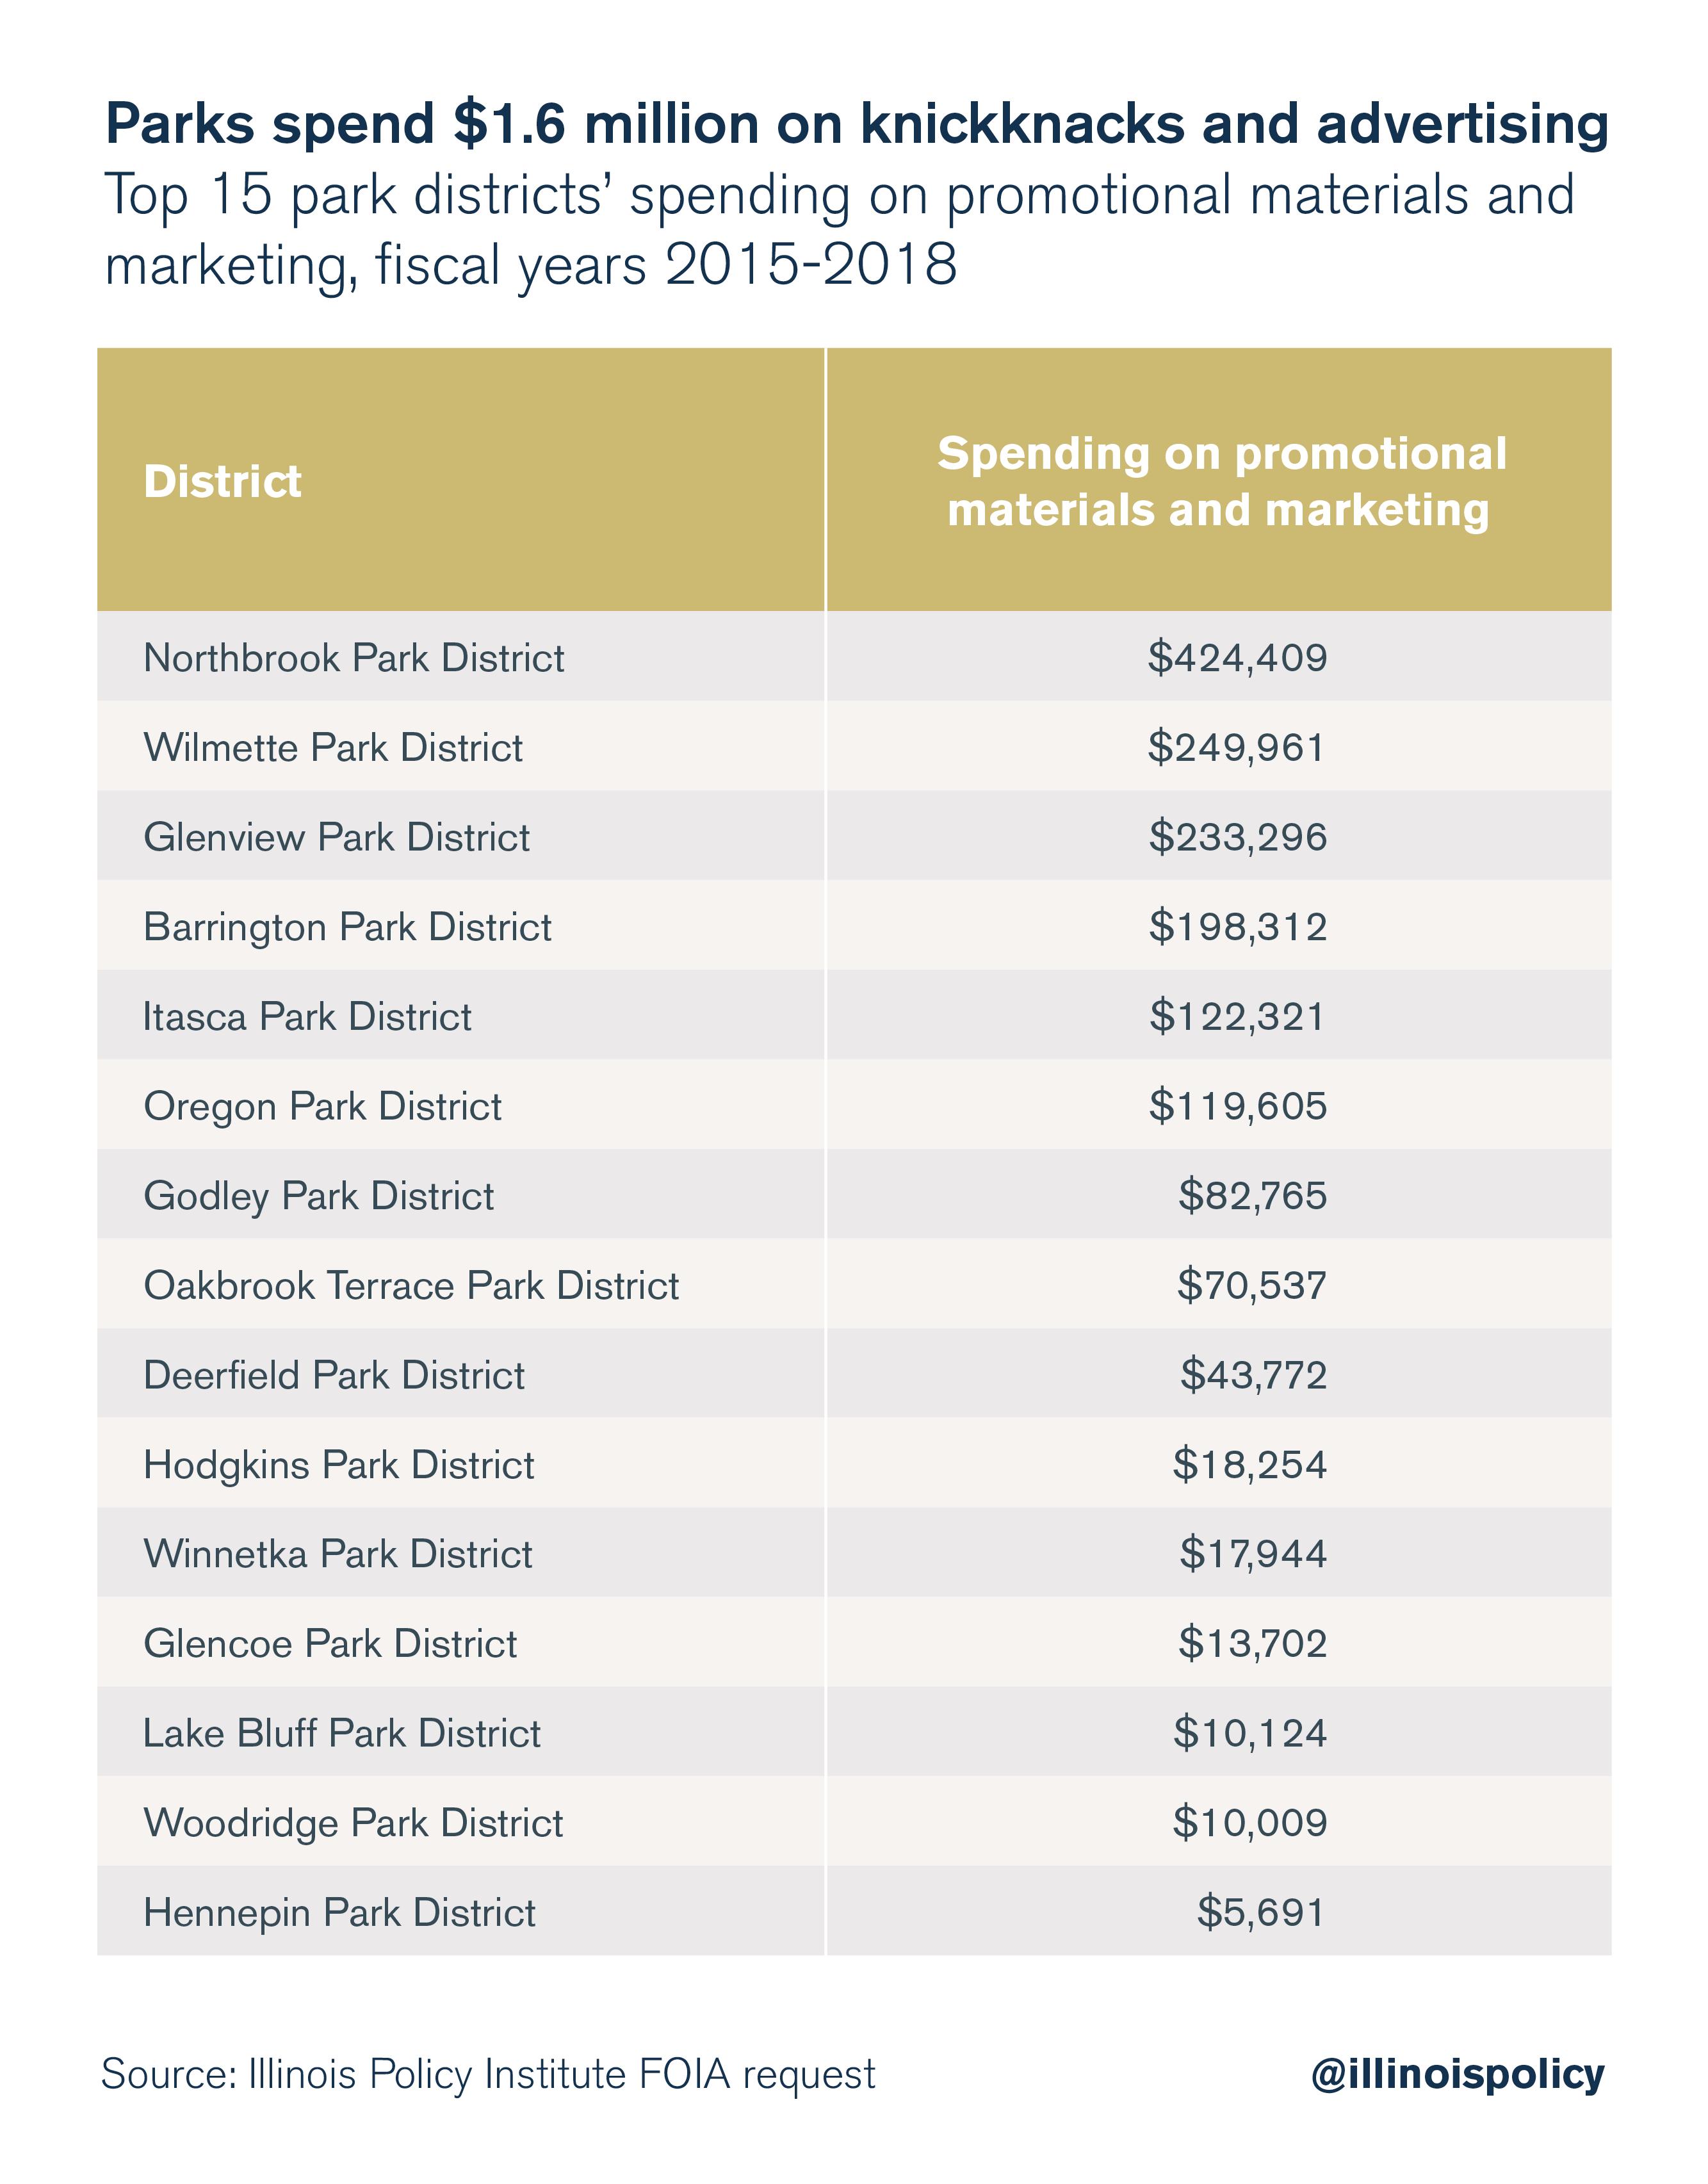 Parks spend $1.6 million on knickknacks and advertising